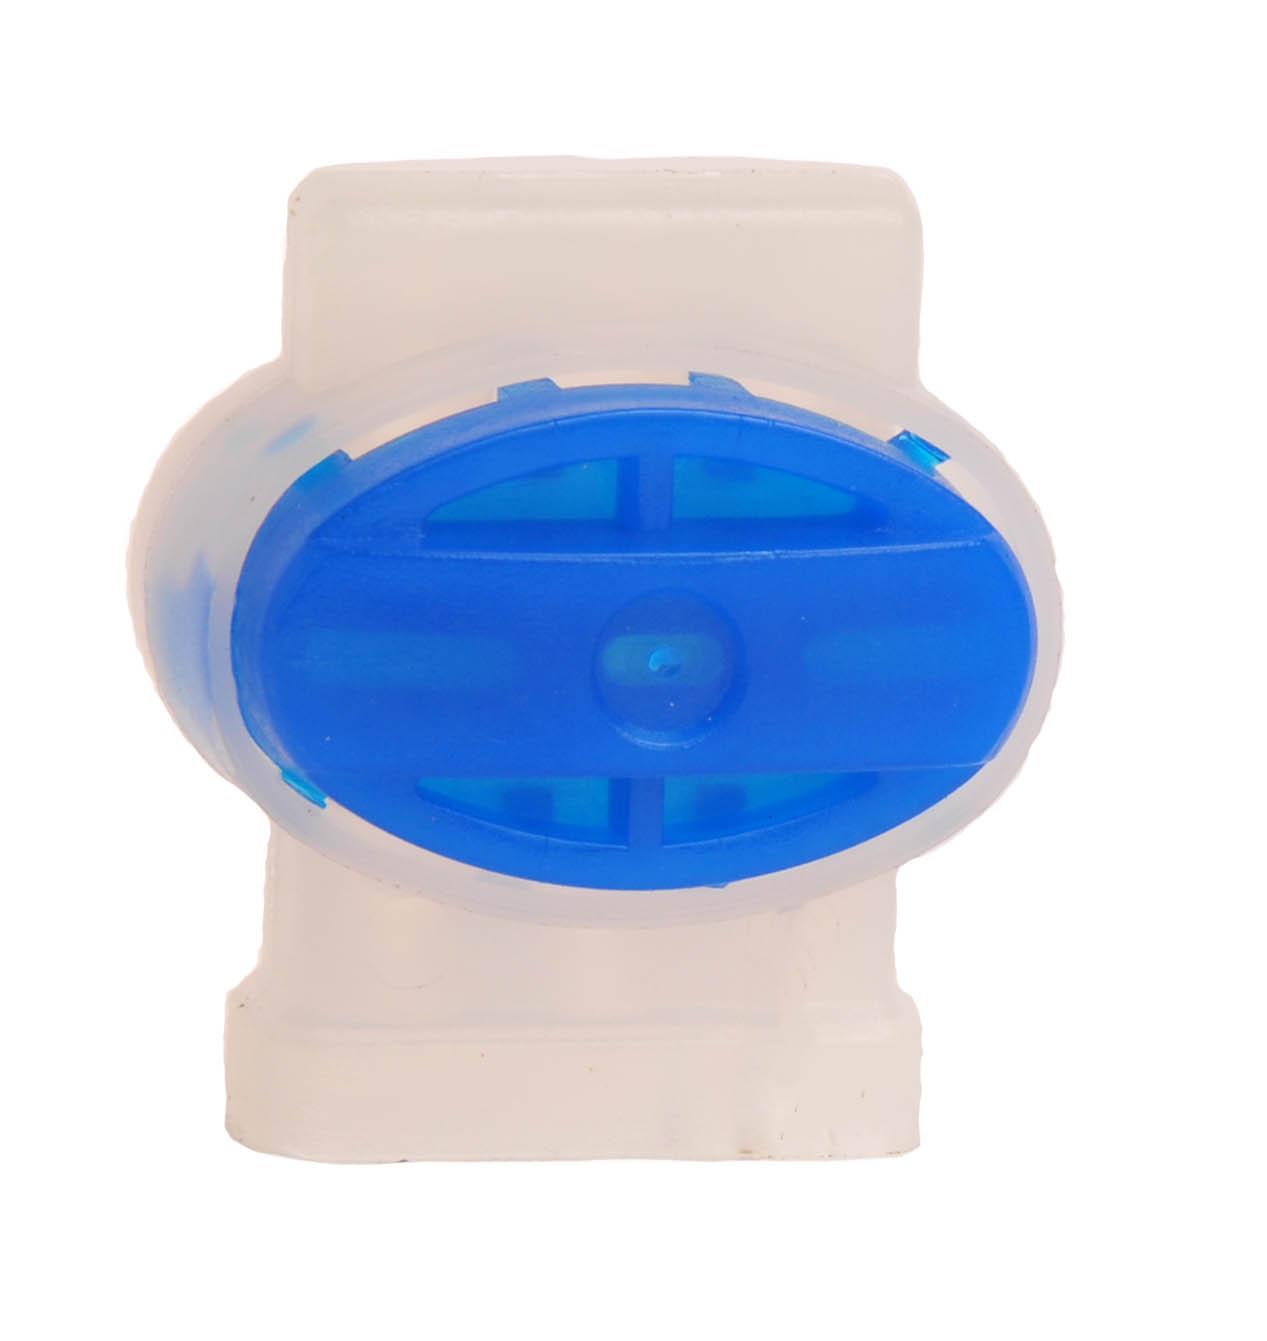 3M 22-14 Moisture Resistant IDC